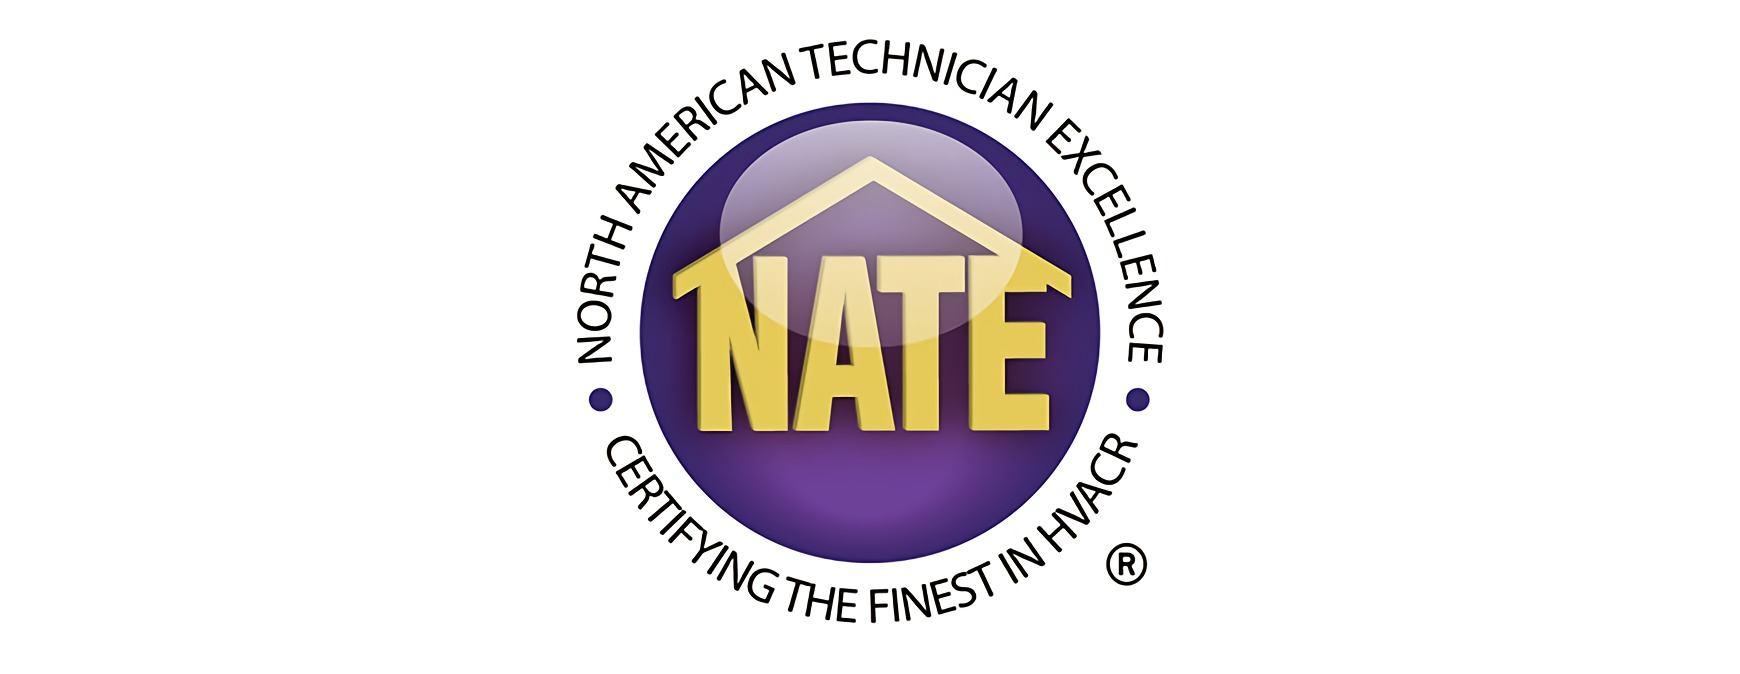 nate certification for hvac